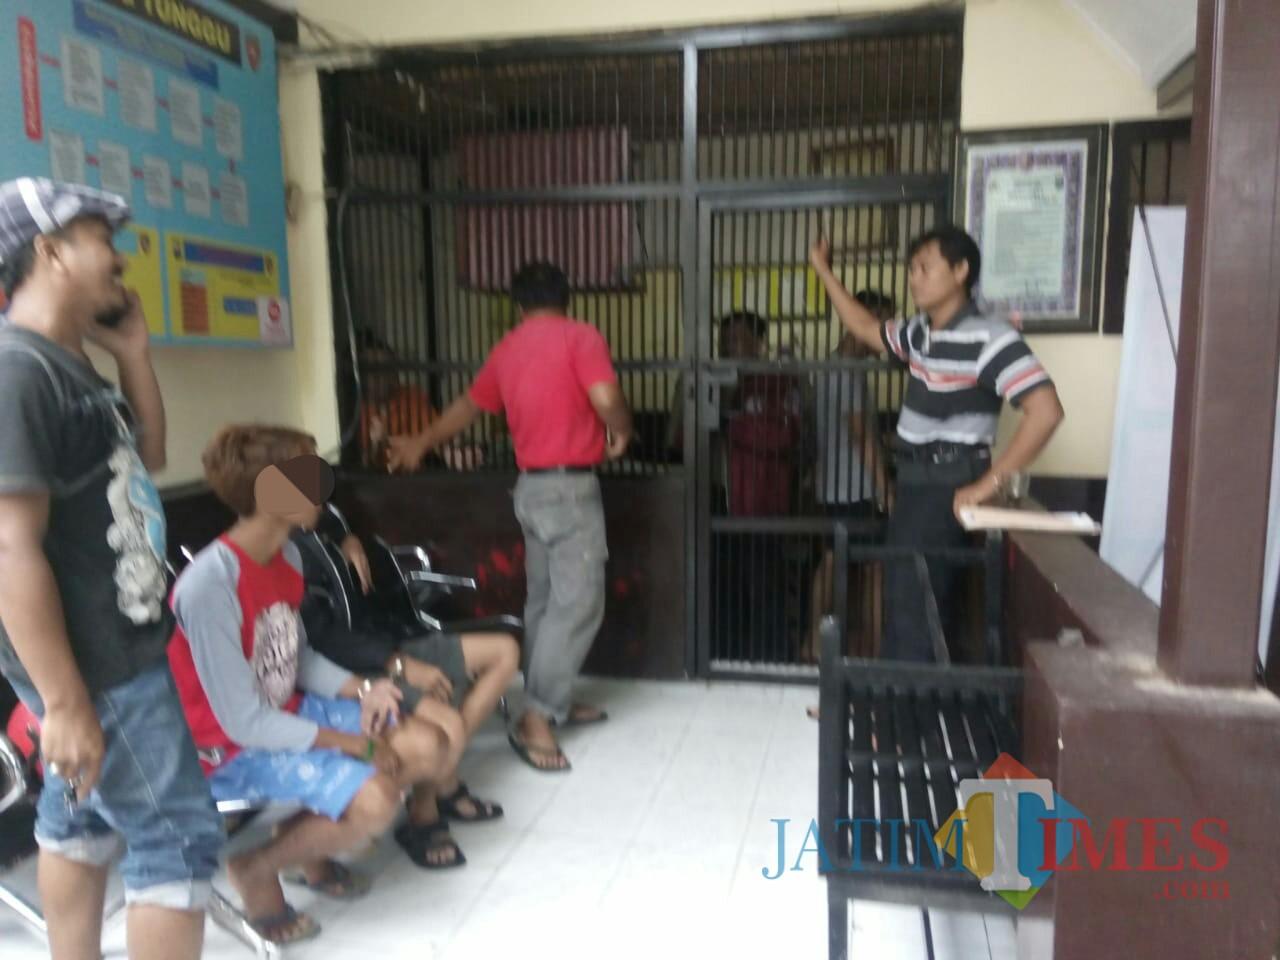 Dua tersangka saat dipindah ke Tahanan Mapolres Tulungagung / Foto : Dokpol / Tulungagung TIMES